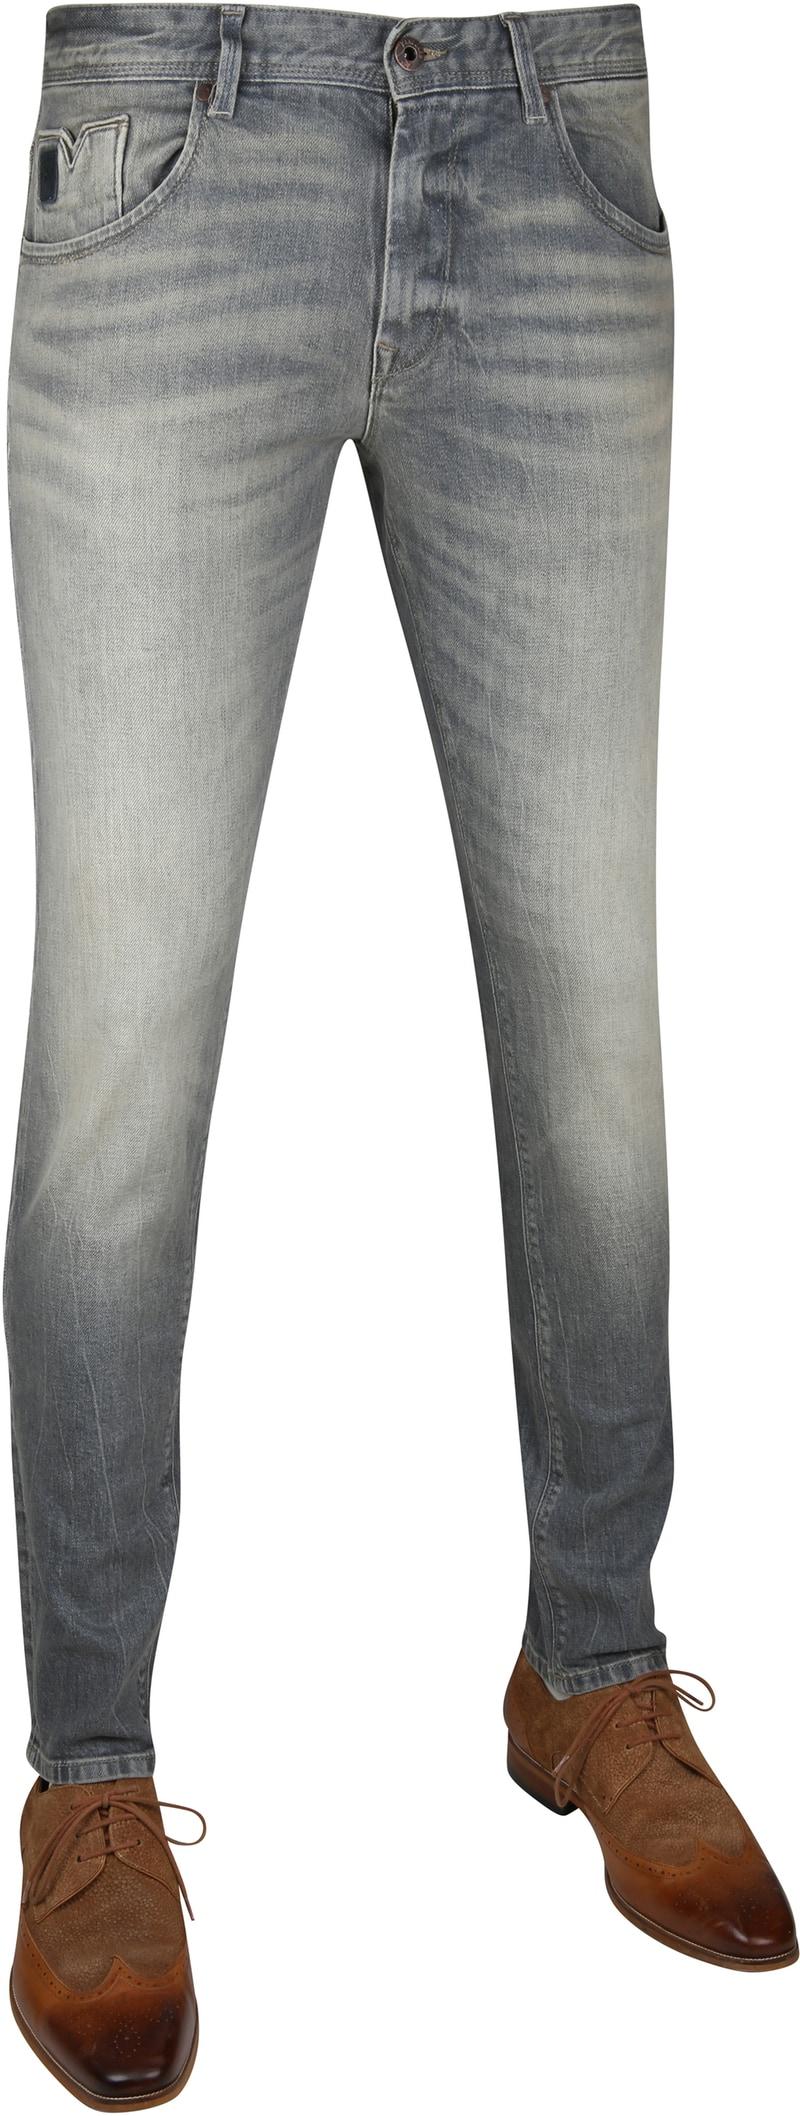 Vanguard V7 Rider Jeans Grey Beige photo 0